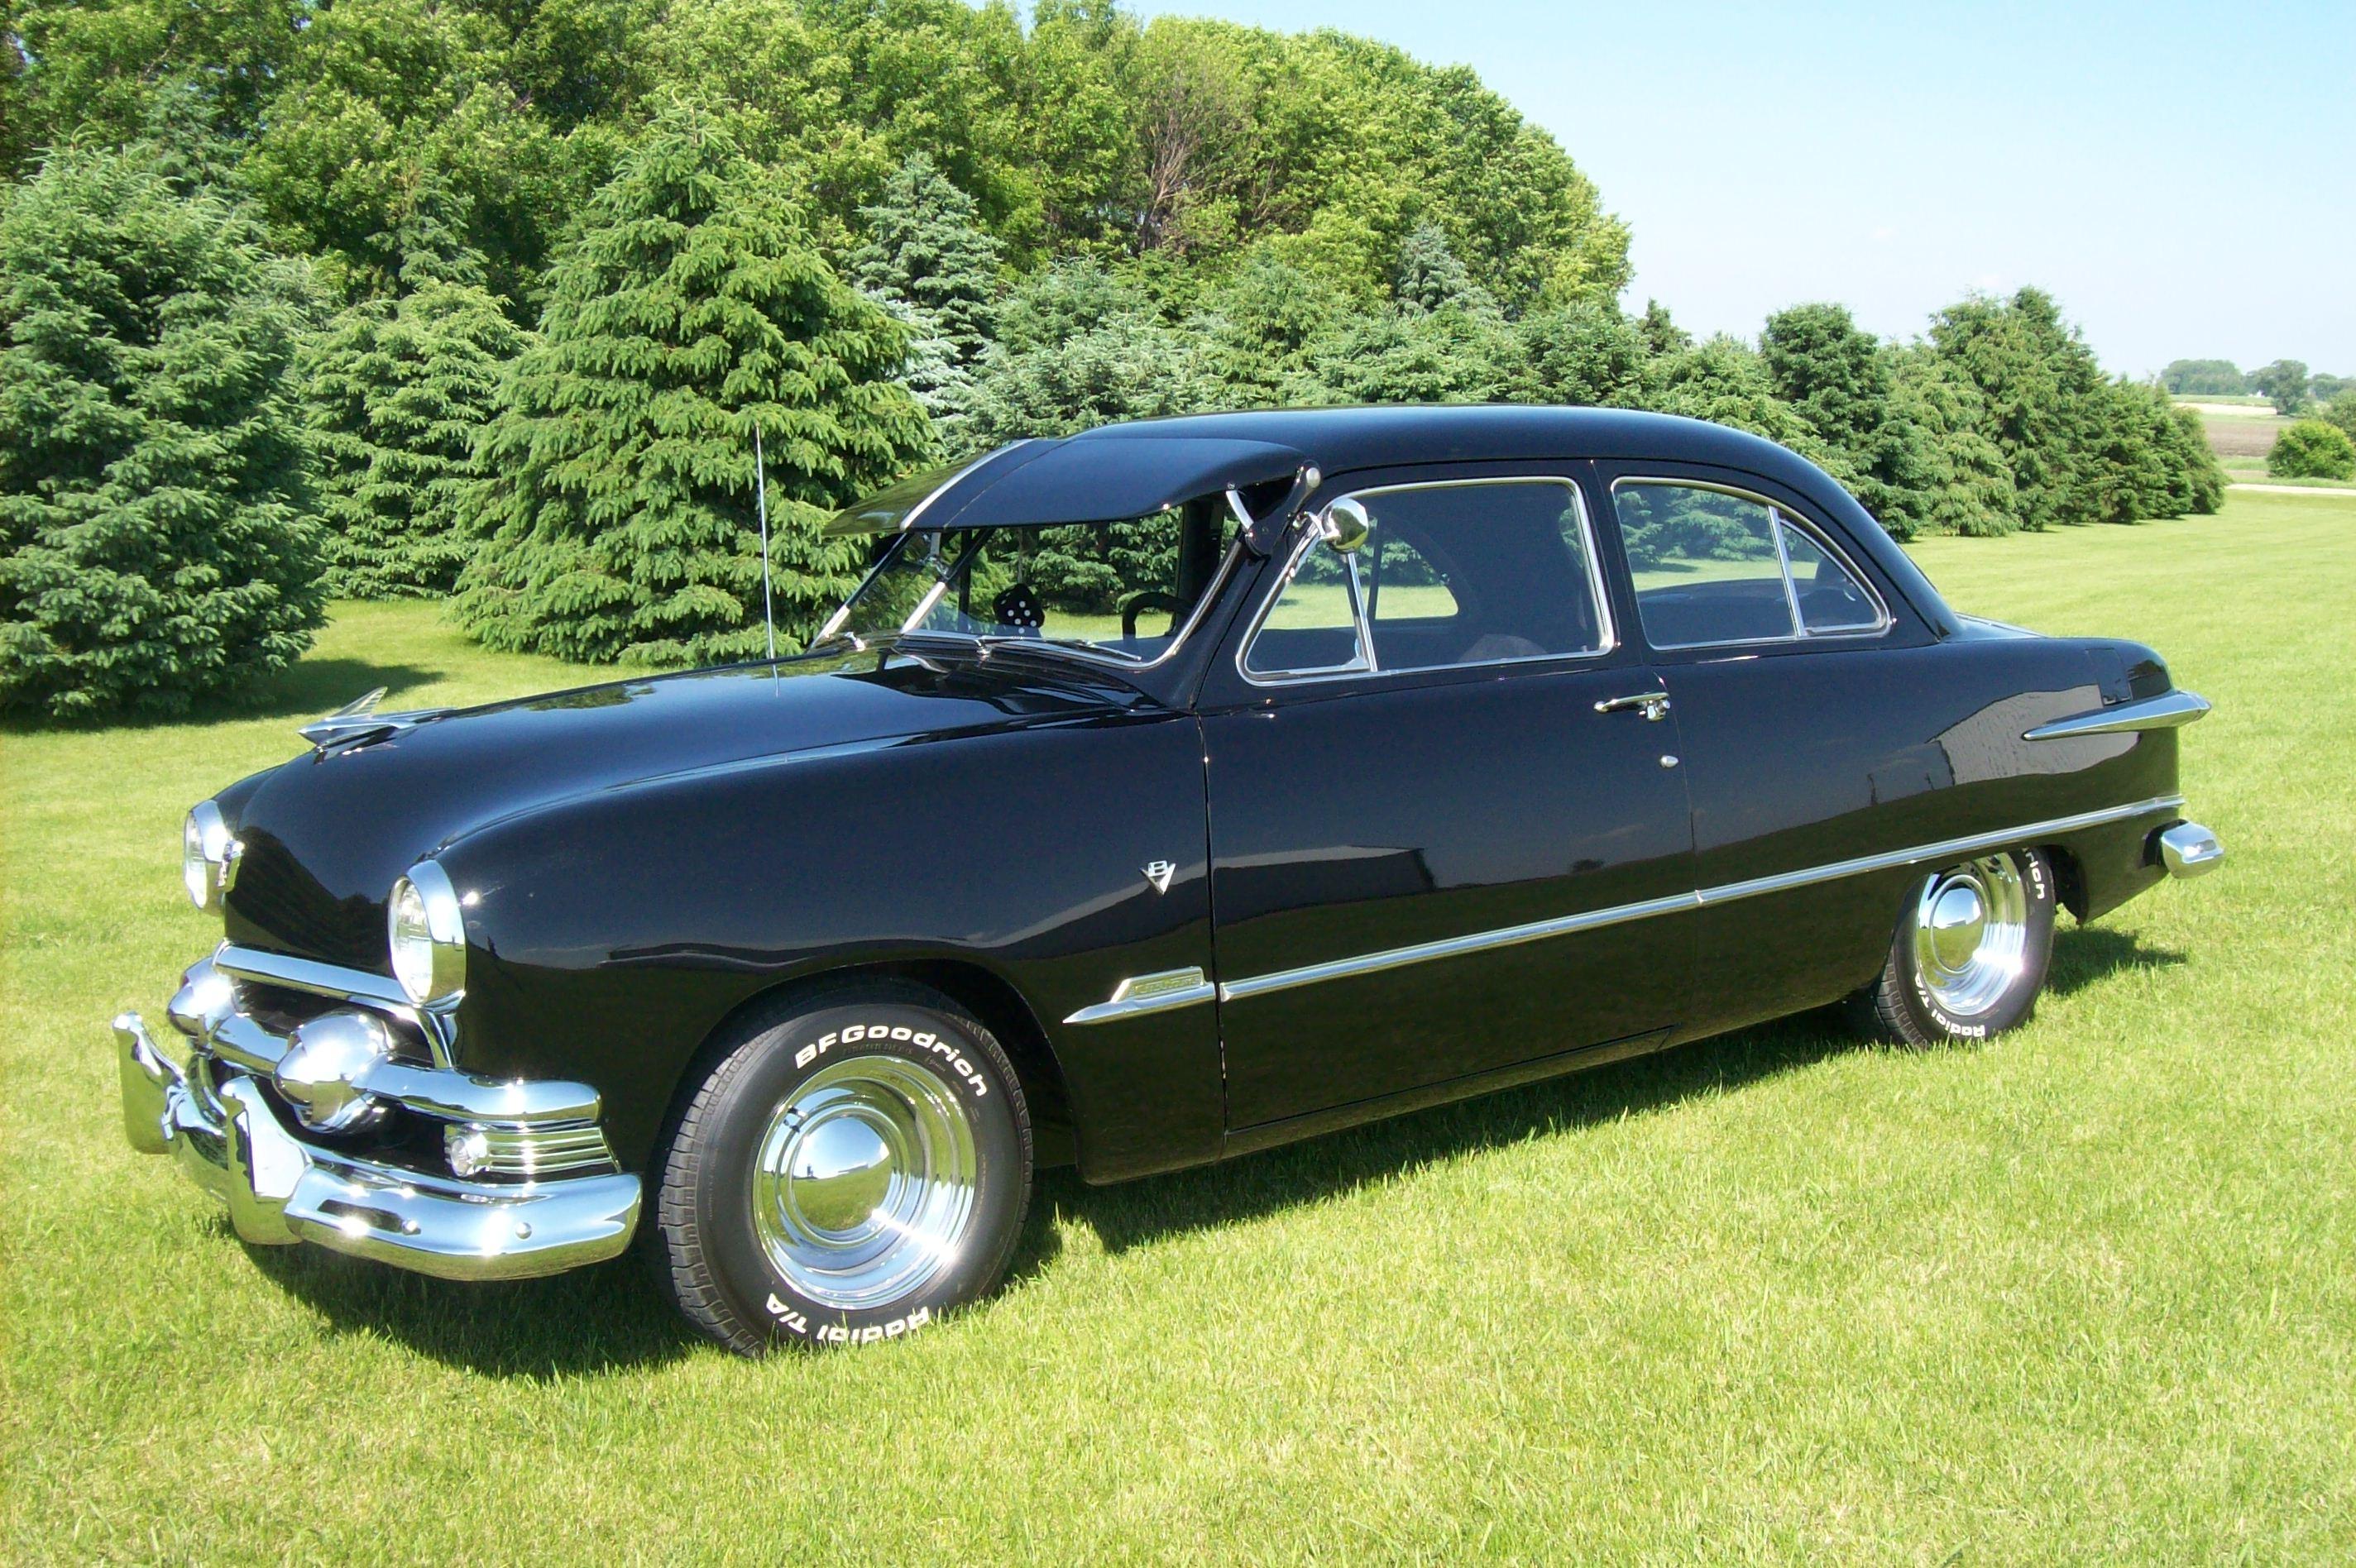 1951 Ford 2door Sedan The Hamb 1949 2 Door Hardtop 100 0287